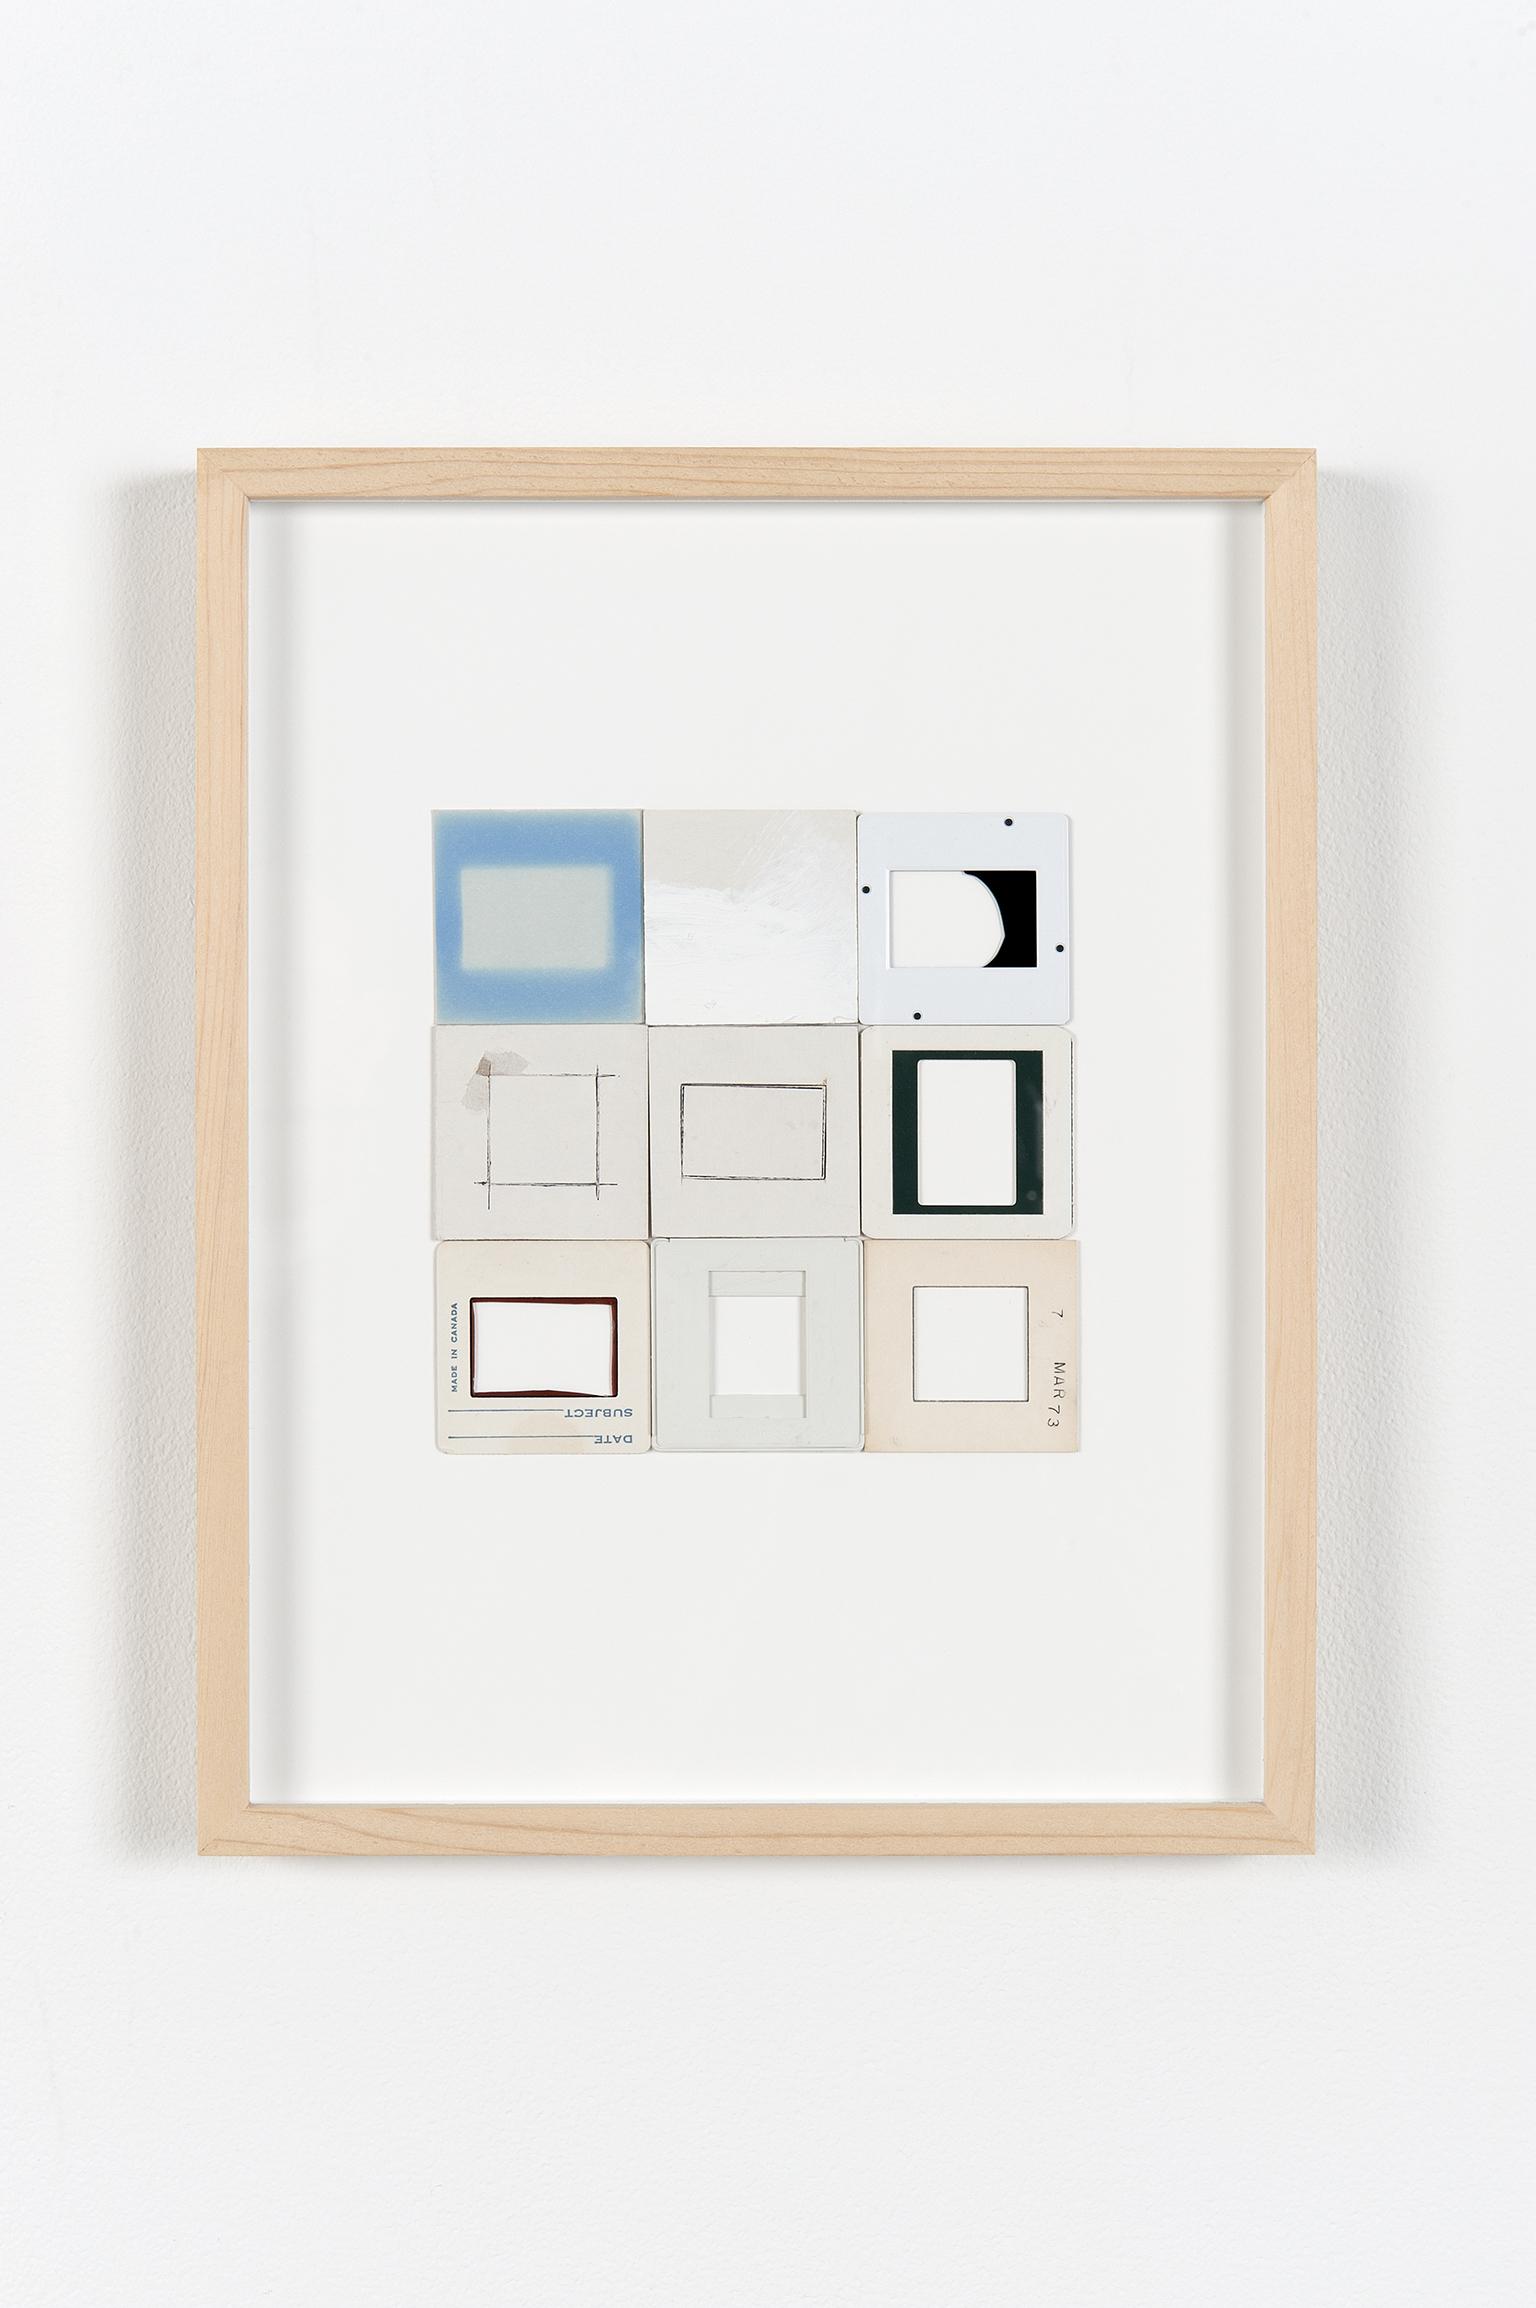 Robert Kleyn, 9 Out of 12 Slides, 1973, slide mounts and dummy slides on cardboard, 13 x 10 in. (33 x 26 cm)   by